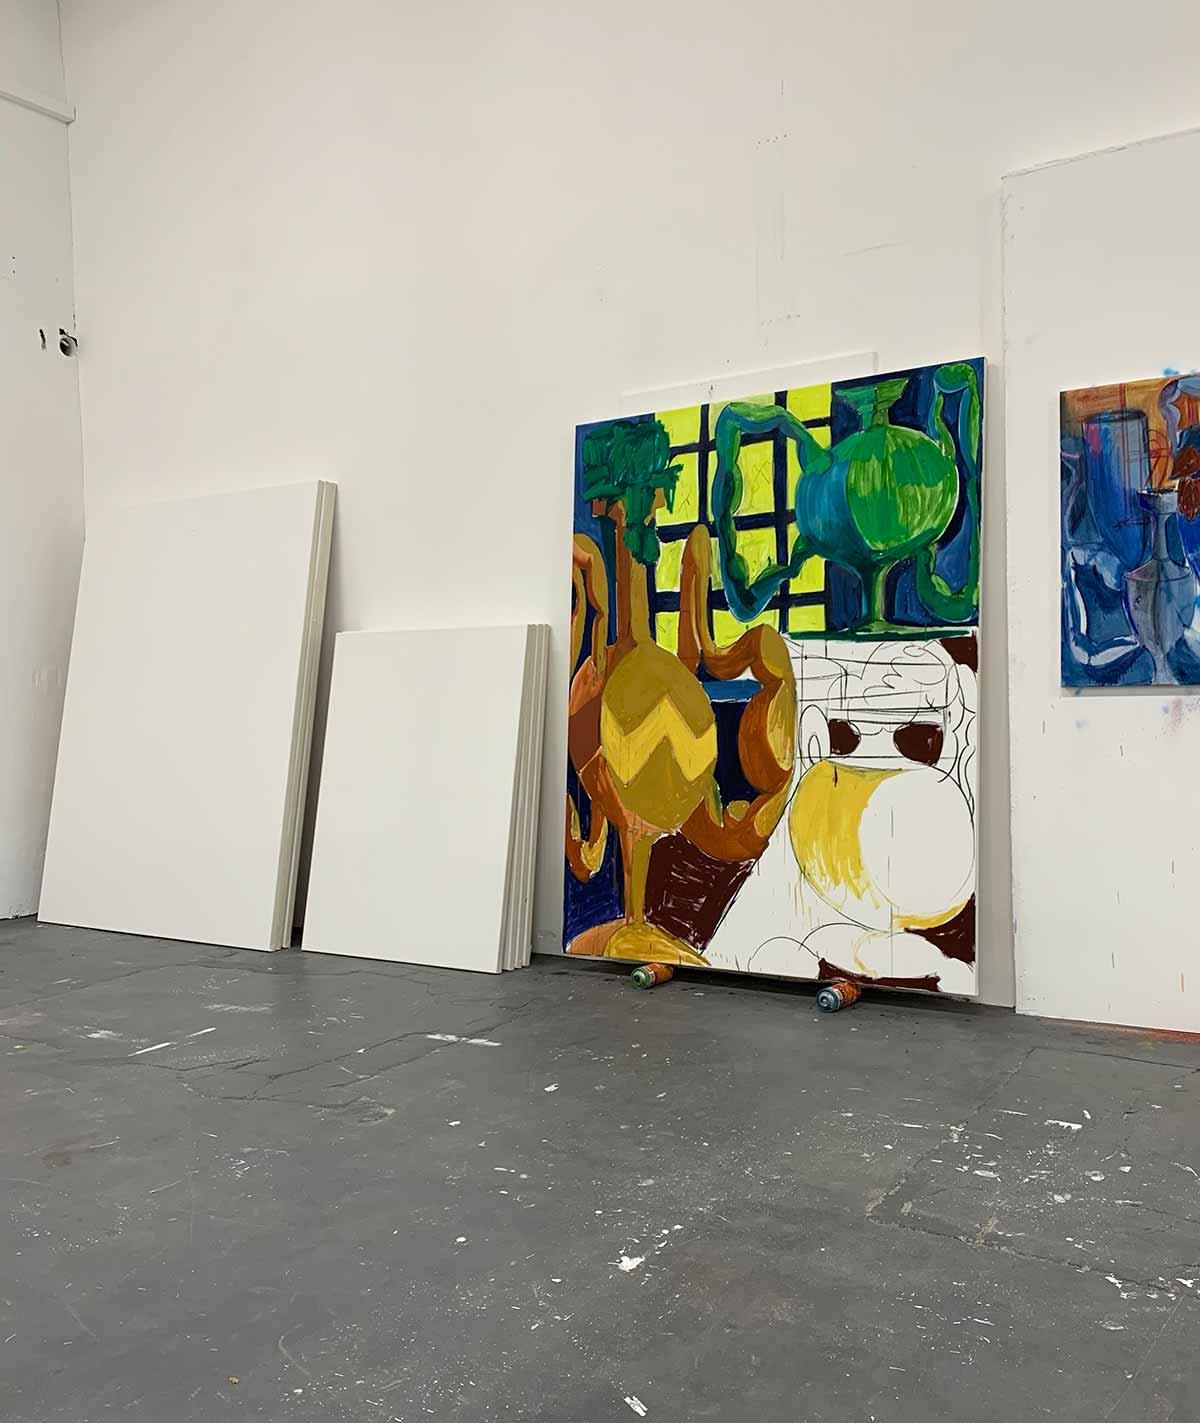 studio lukas sauer zahel, canvases, large works on paper, vogel art edition